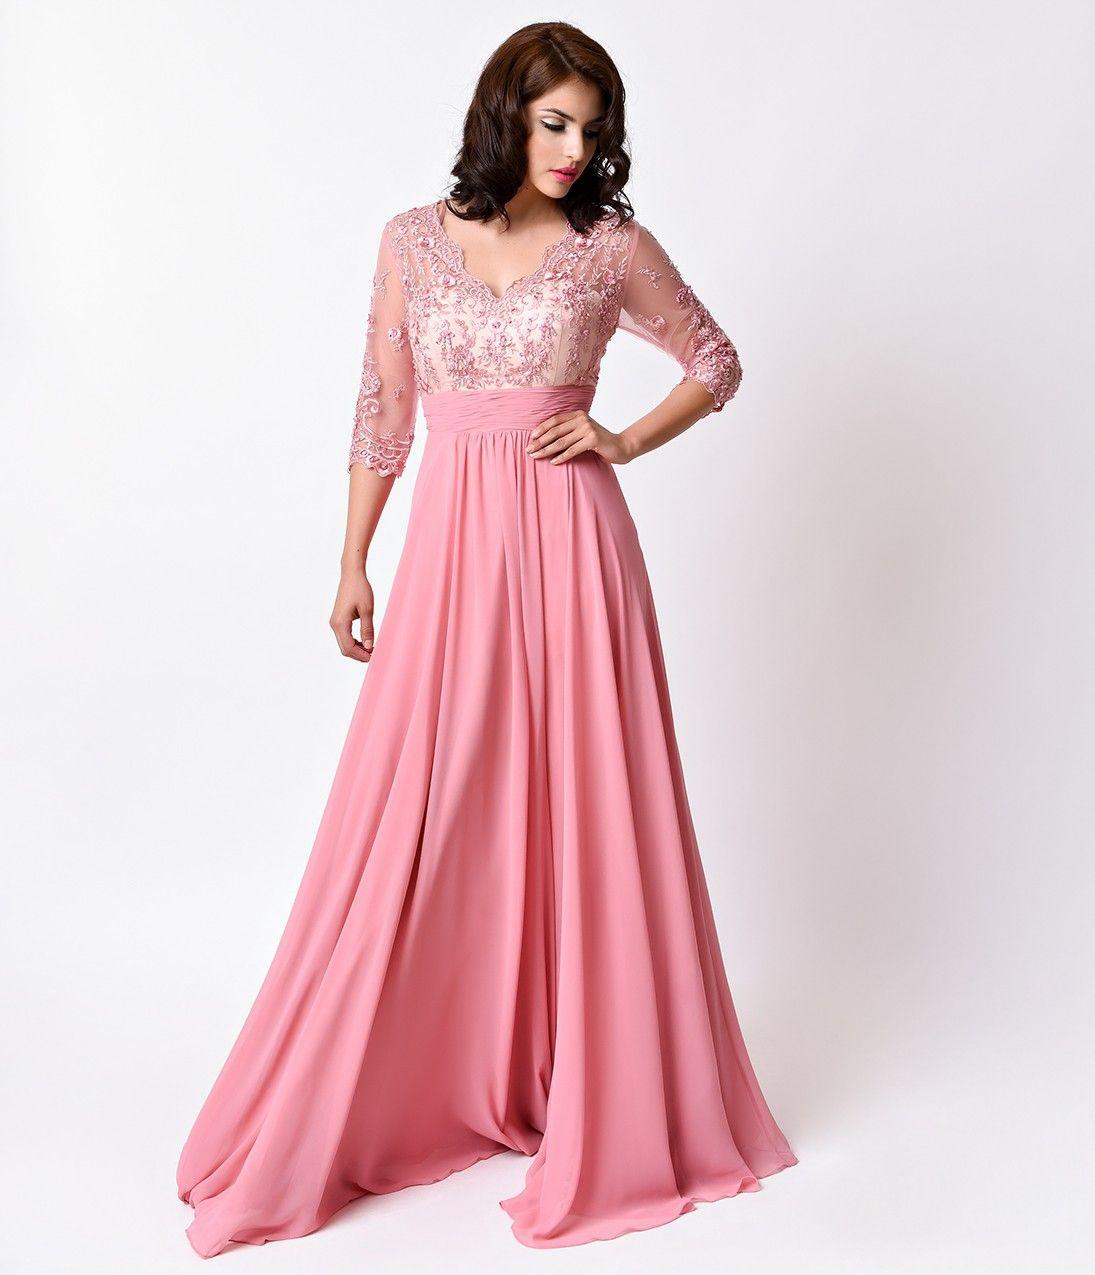 Dusty Rose Pink Sheer Sleeve Empire Waist Long Dress   Fantasy ...